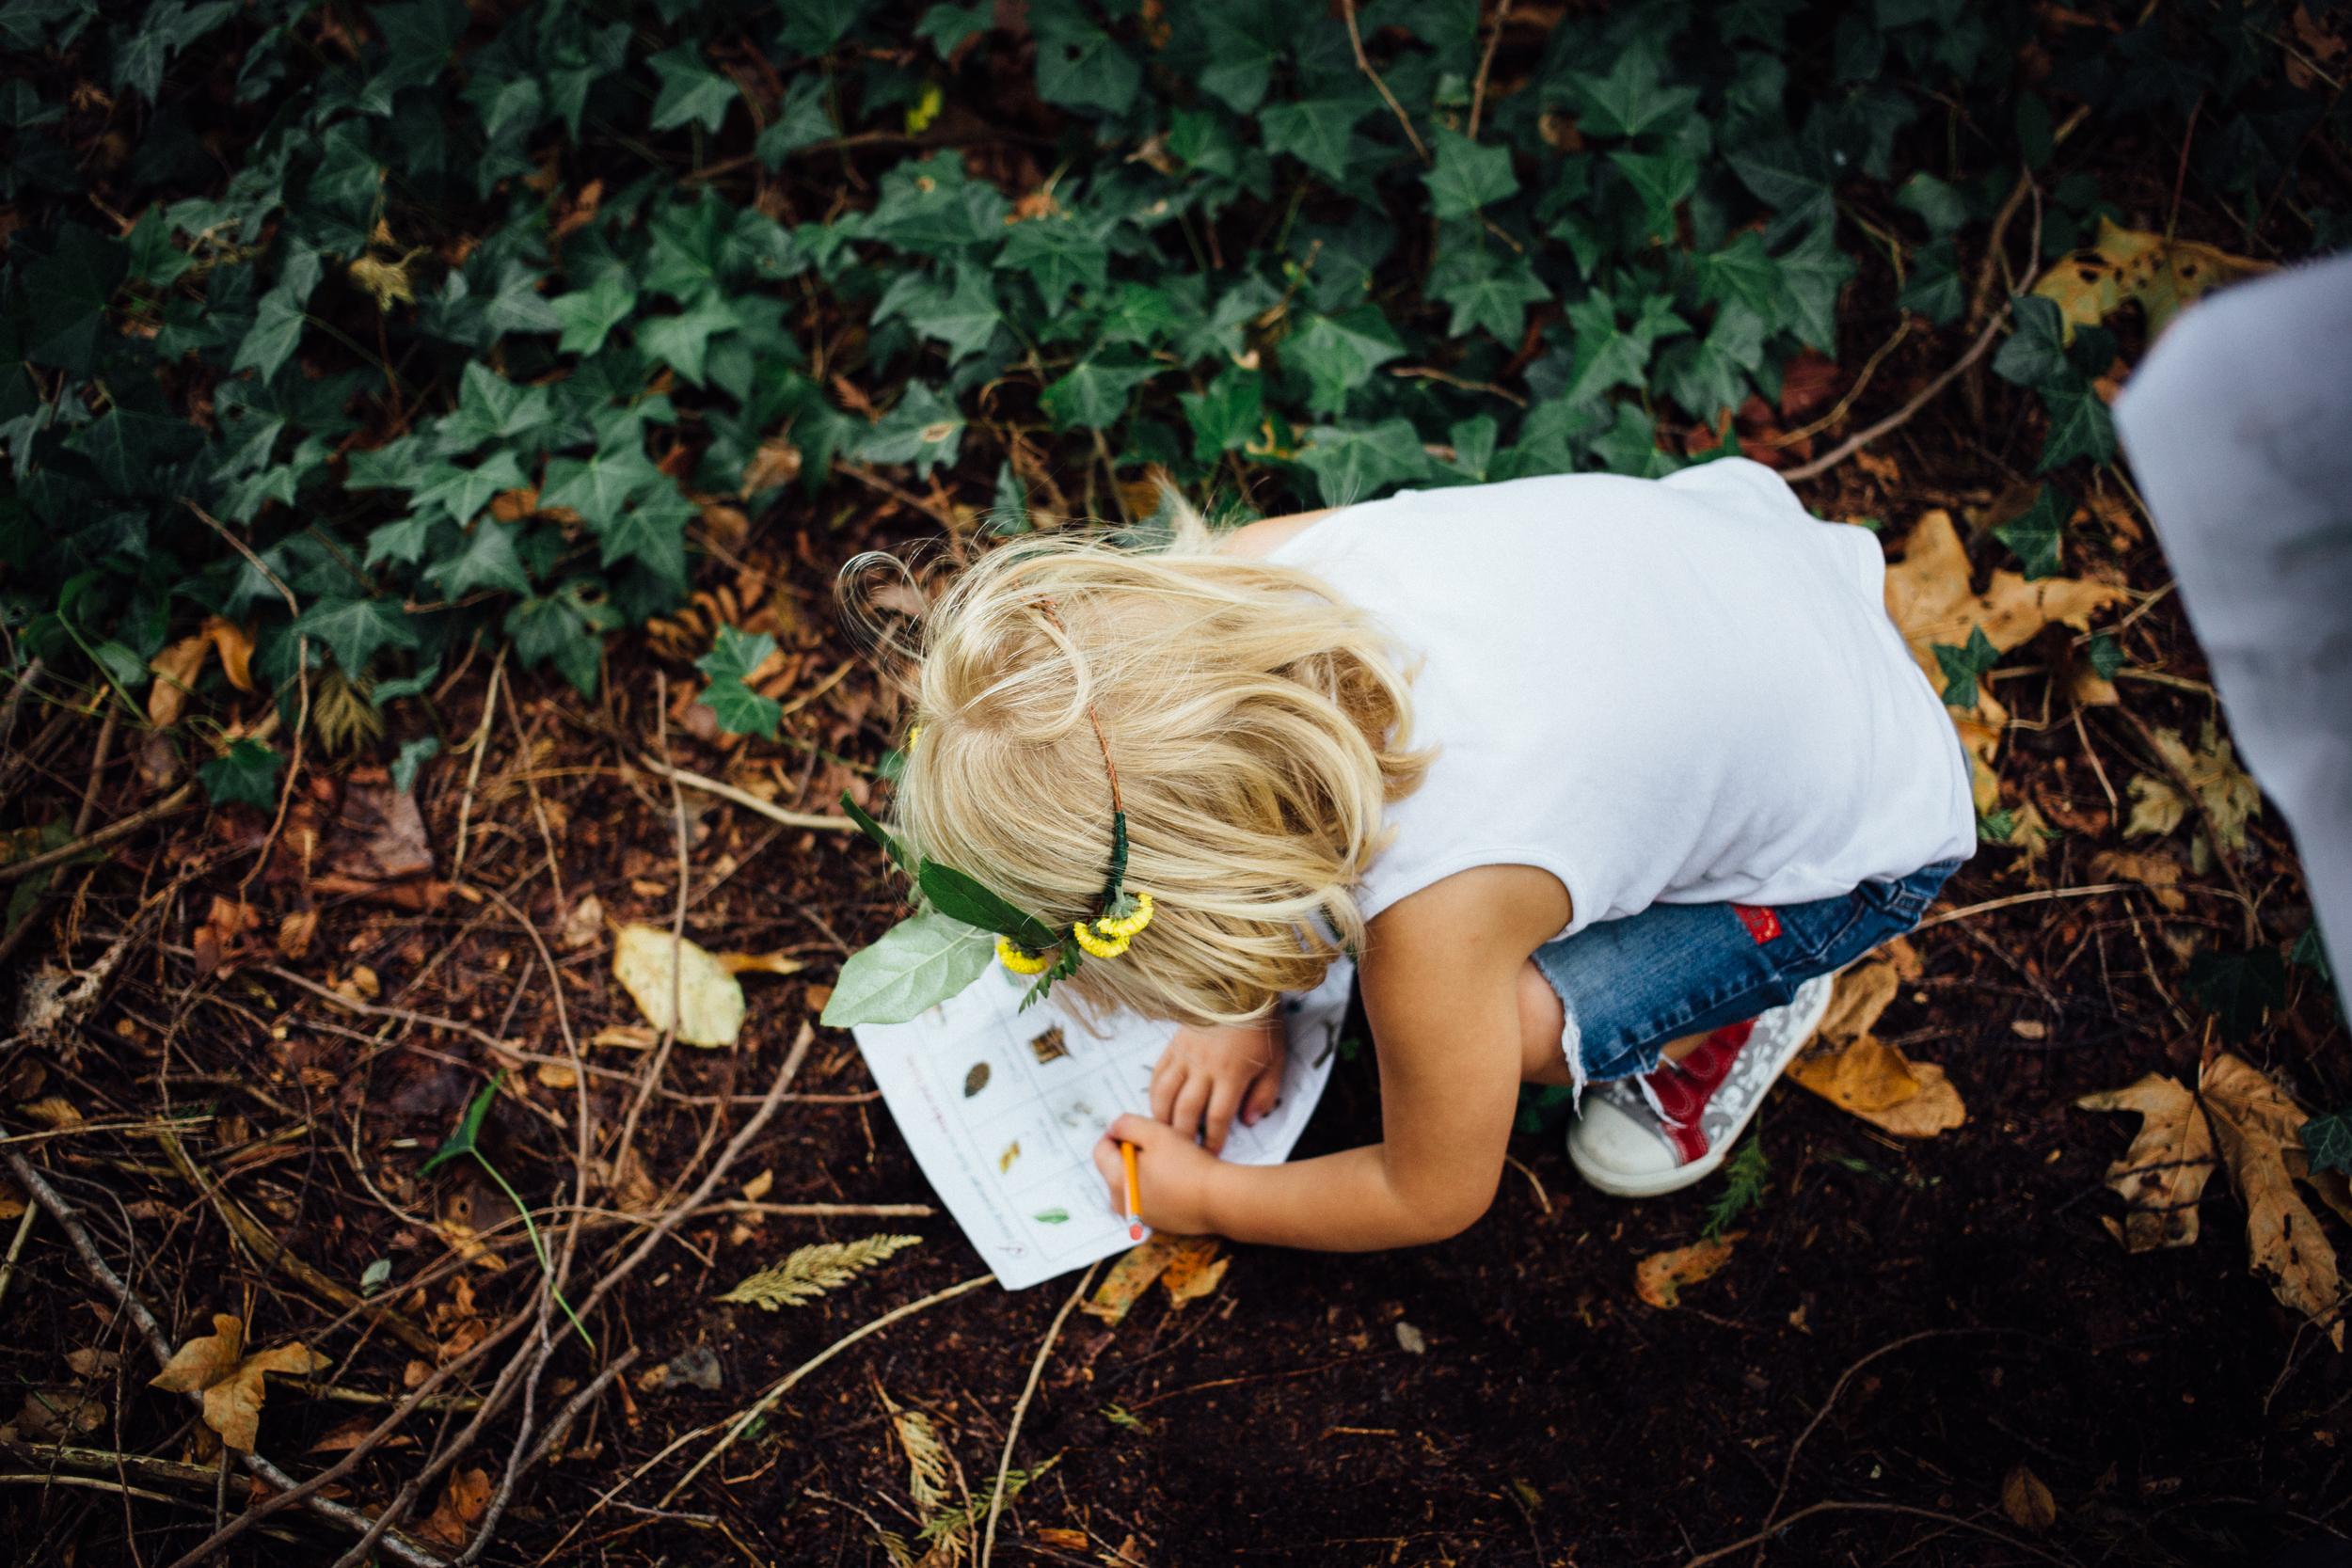 dogwoodphotography_photographer_vancouver_child_roosbday-6.jpg